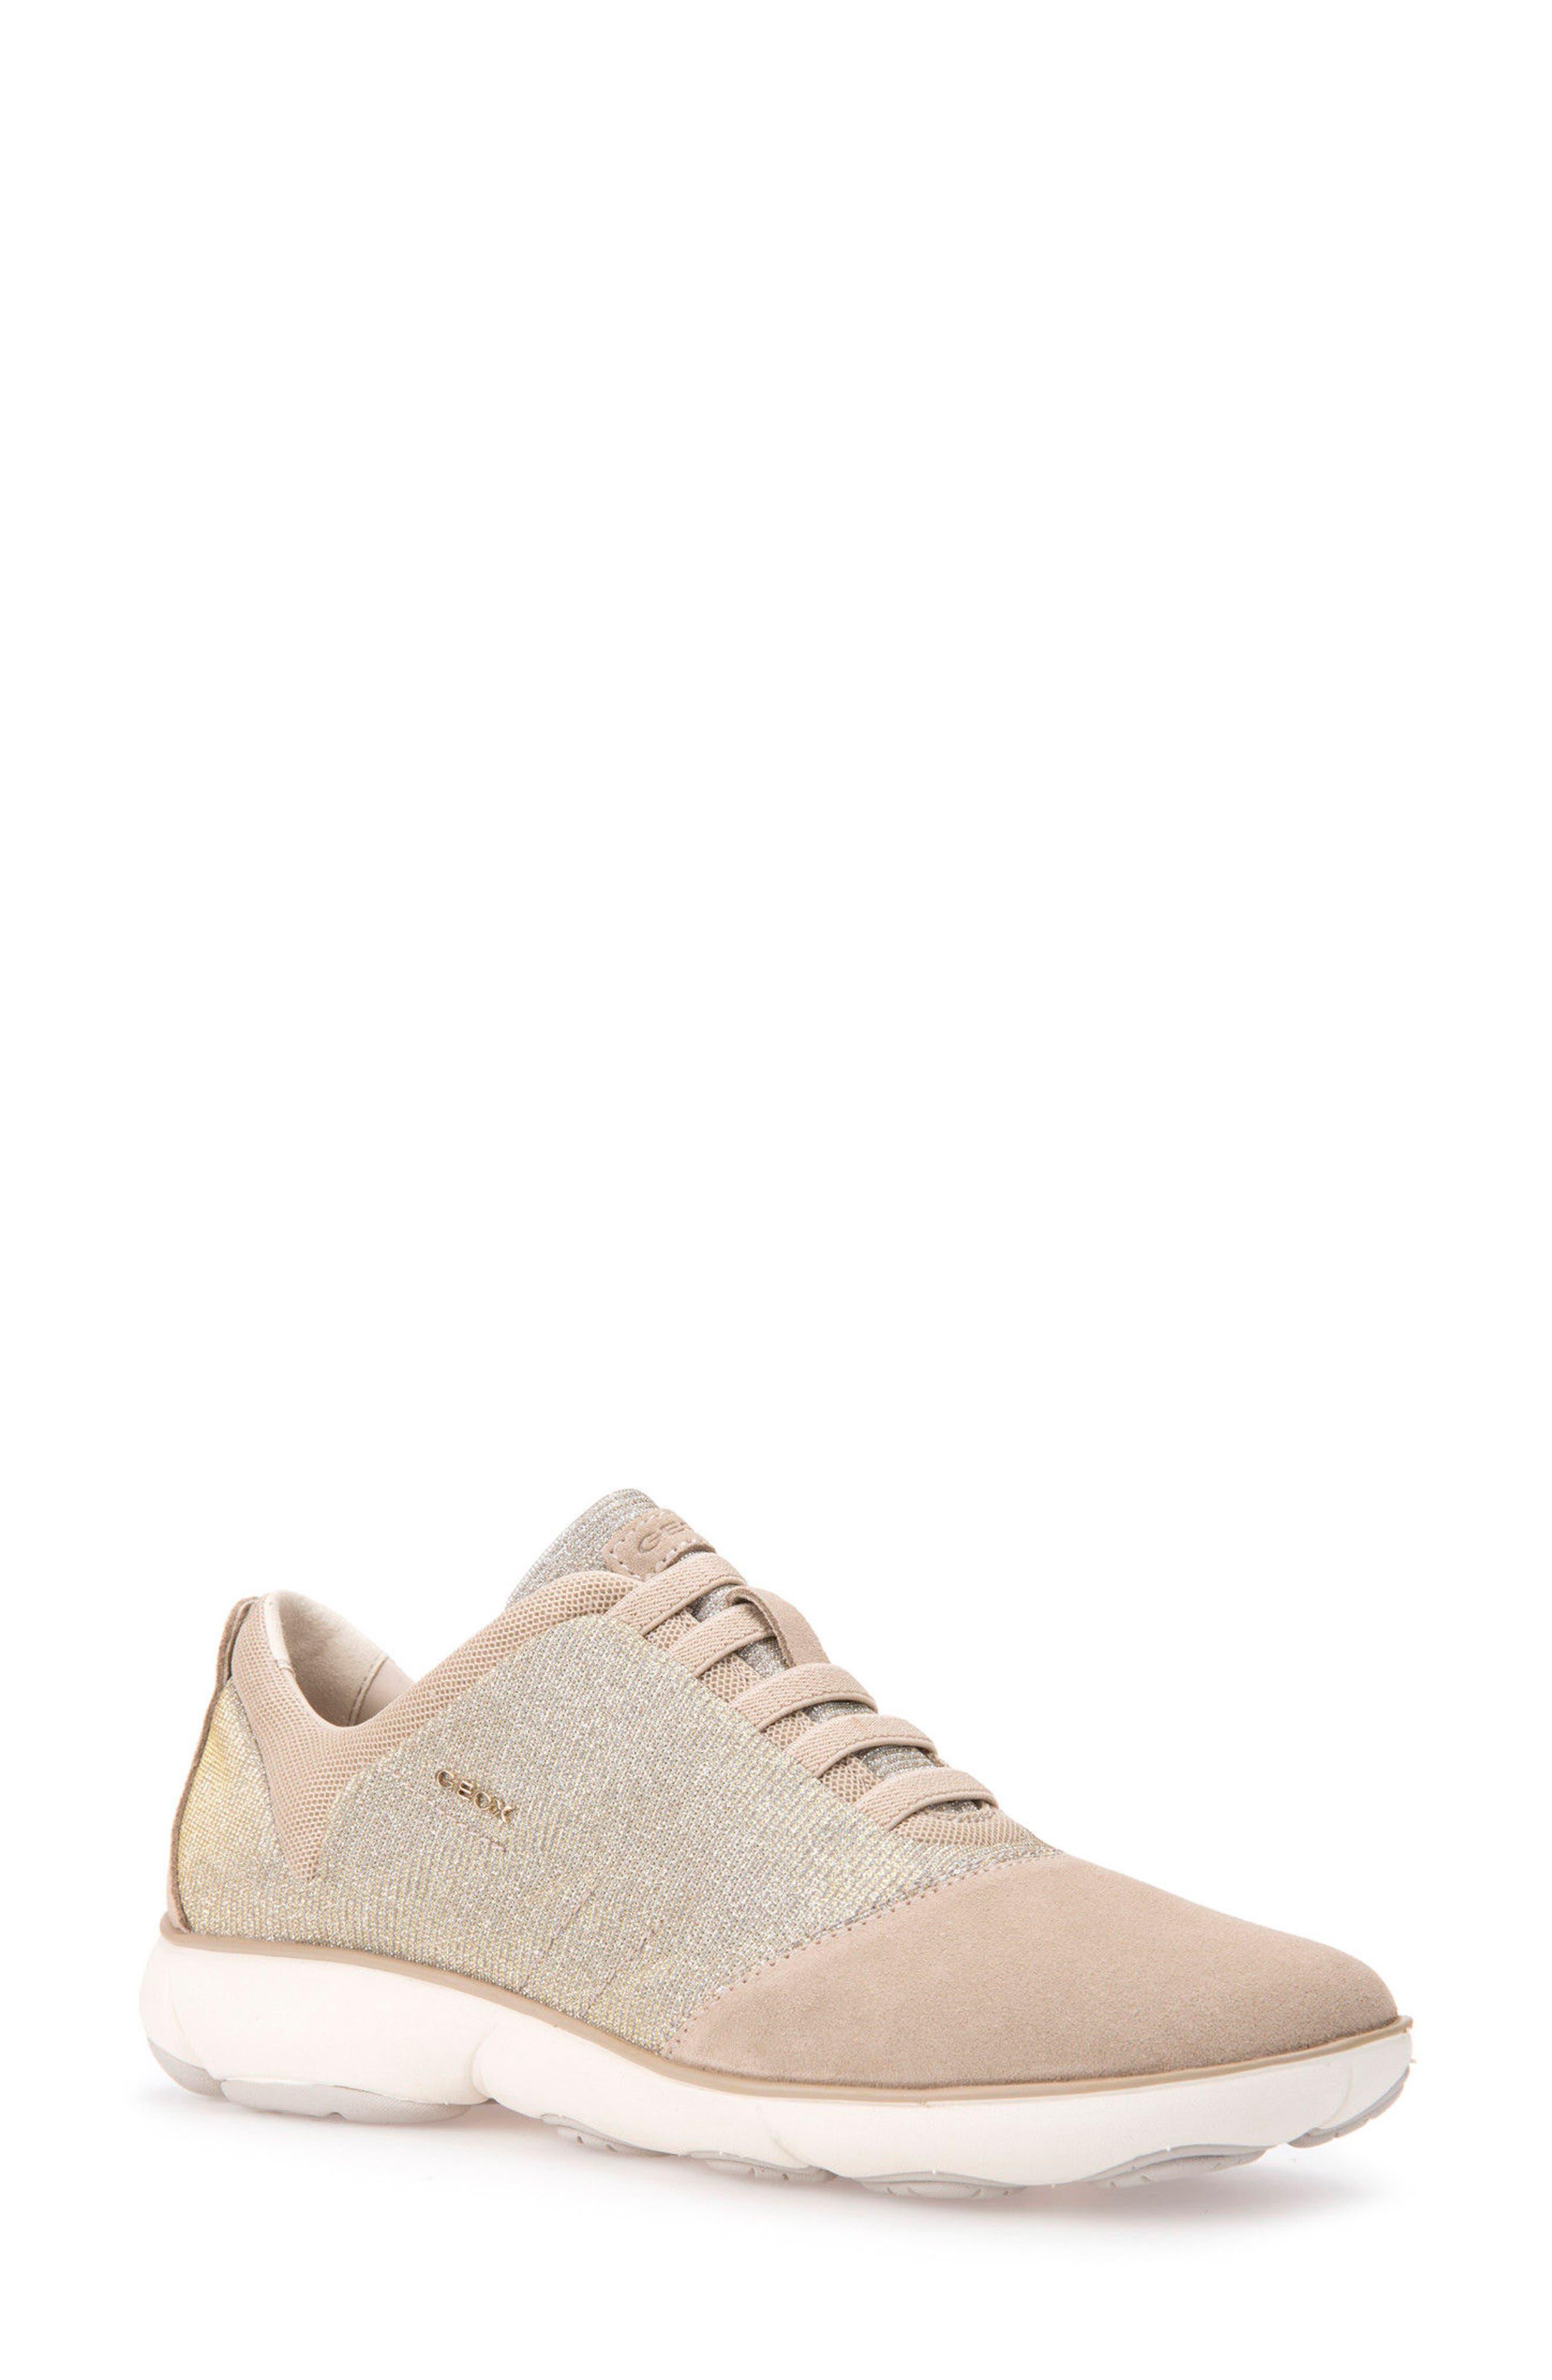 Nebula Slip-On Sneaker,                         Main,                         color, Taupe Fabric